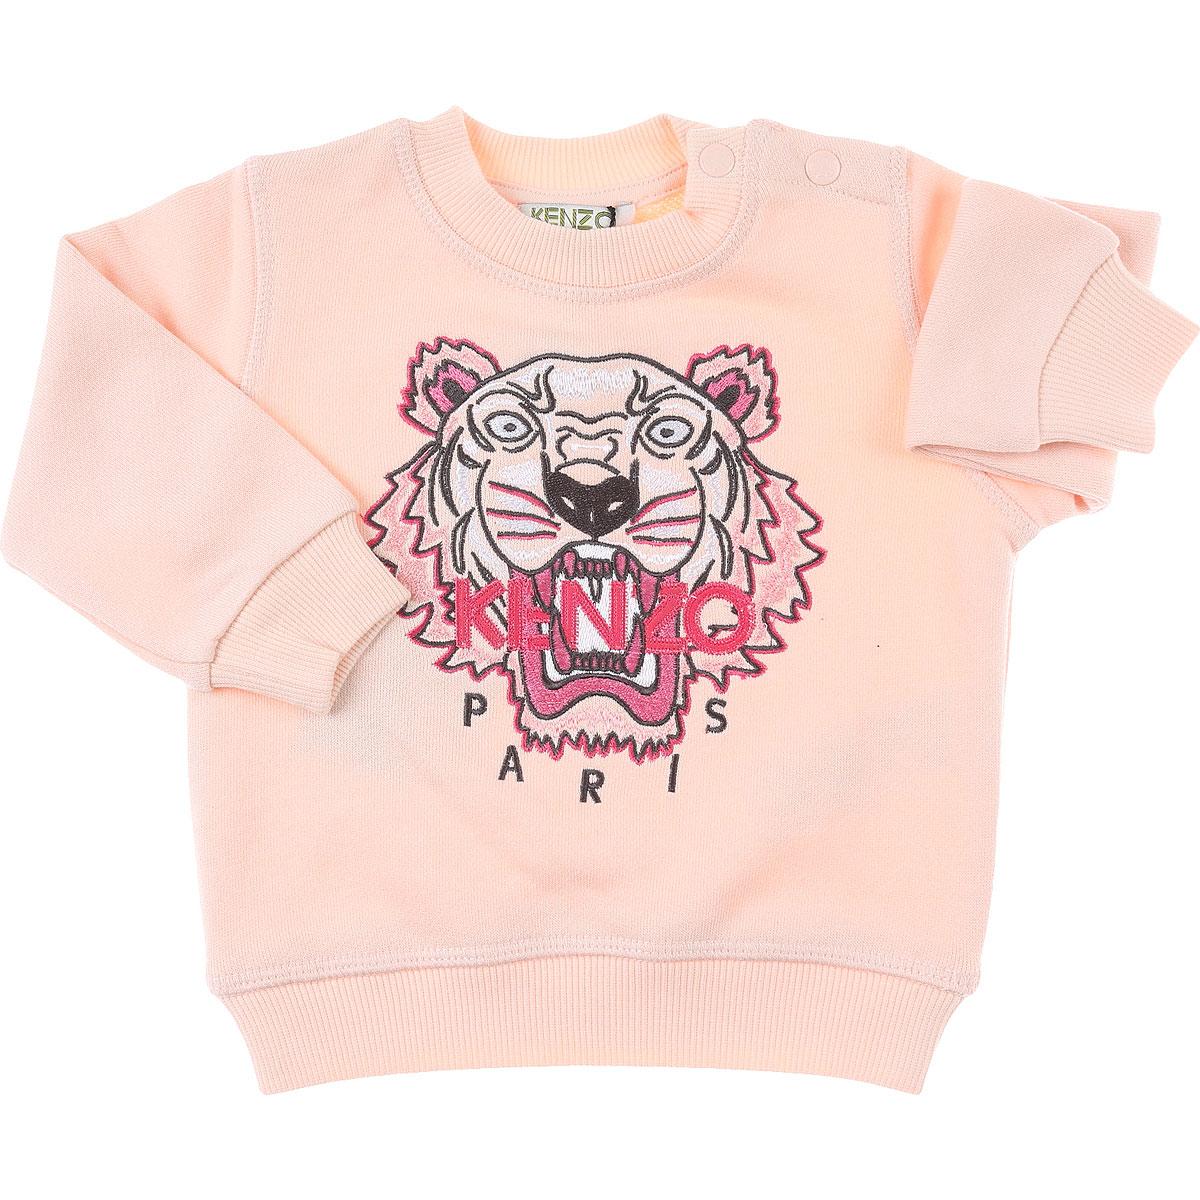 Kenzo Baby Sweatshirts & Hoodies for Girls On Sale, Pink, Cotton, 2019, 12M 18M